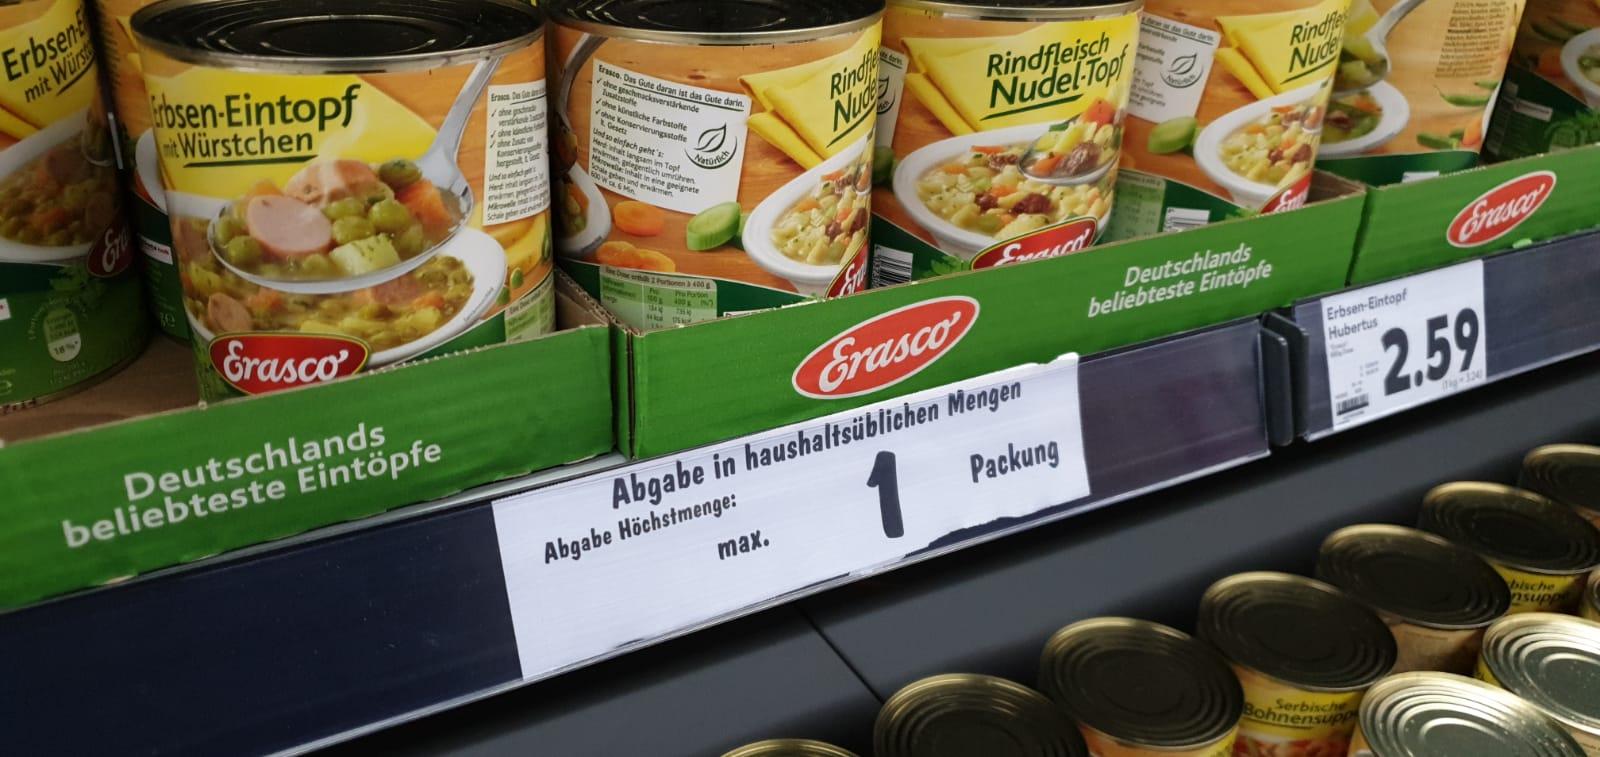 Wegen Der Corona Hamsterkaufe Supermarkte Rationieren Du Bist Halle